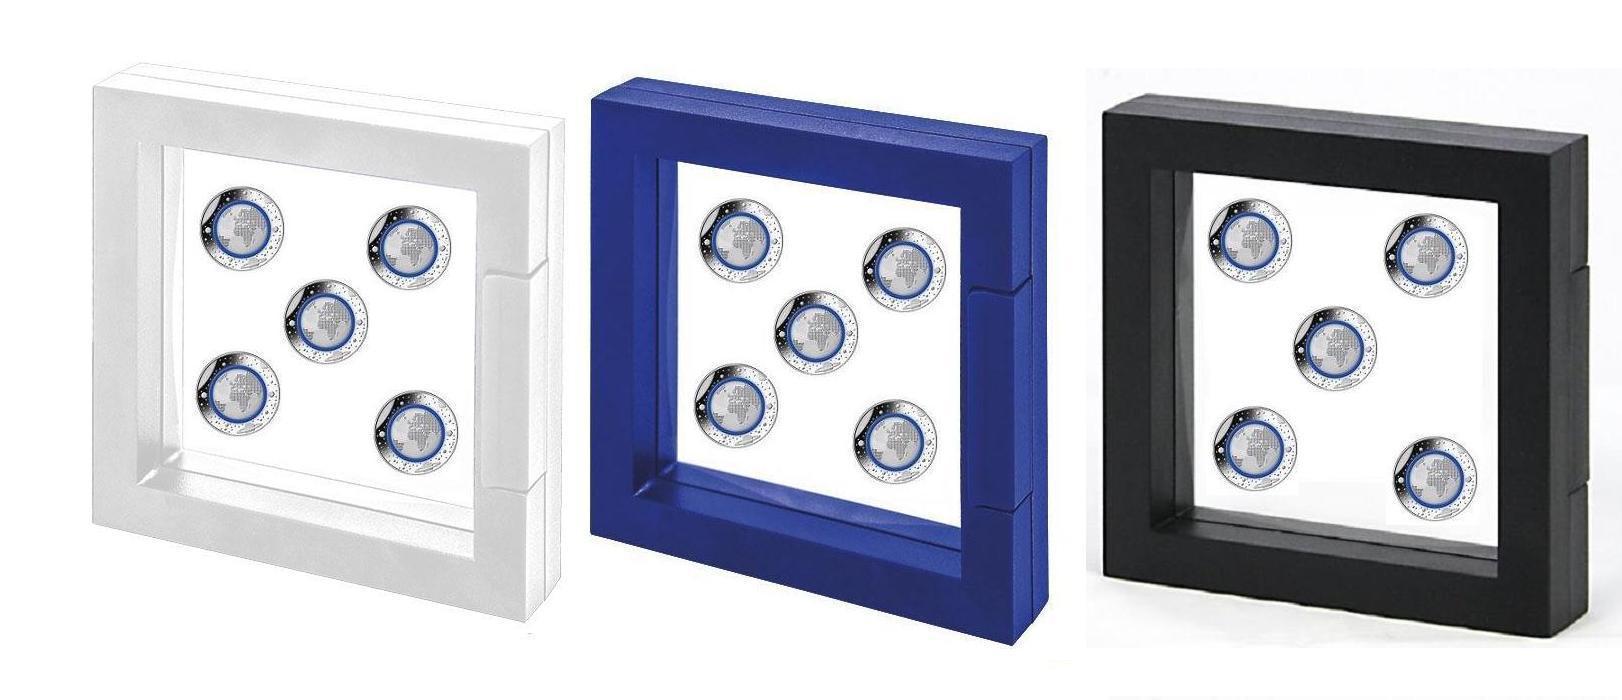 safe 3d schweberahmen universum wei ideal f r 5 x 5 euro. Black Bedroom Furniture Sets. Home Design Ideas